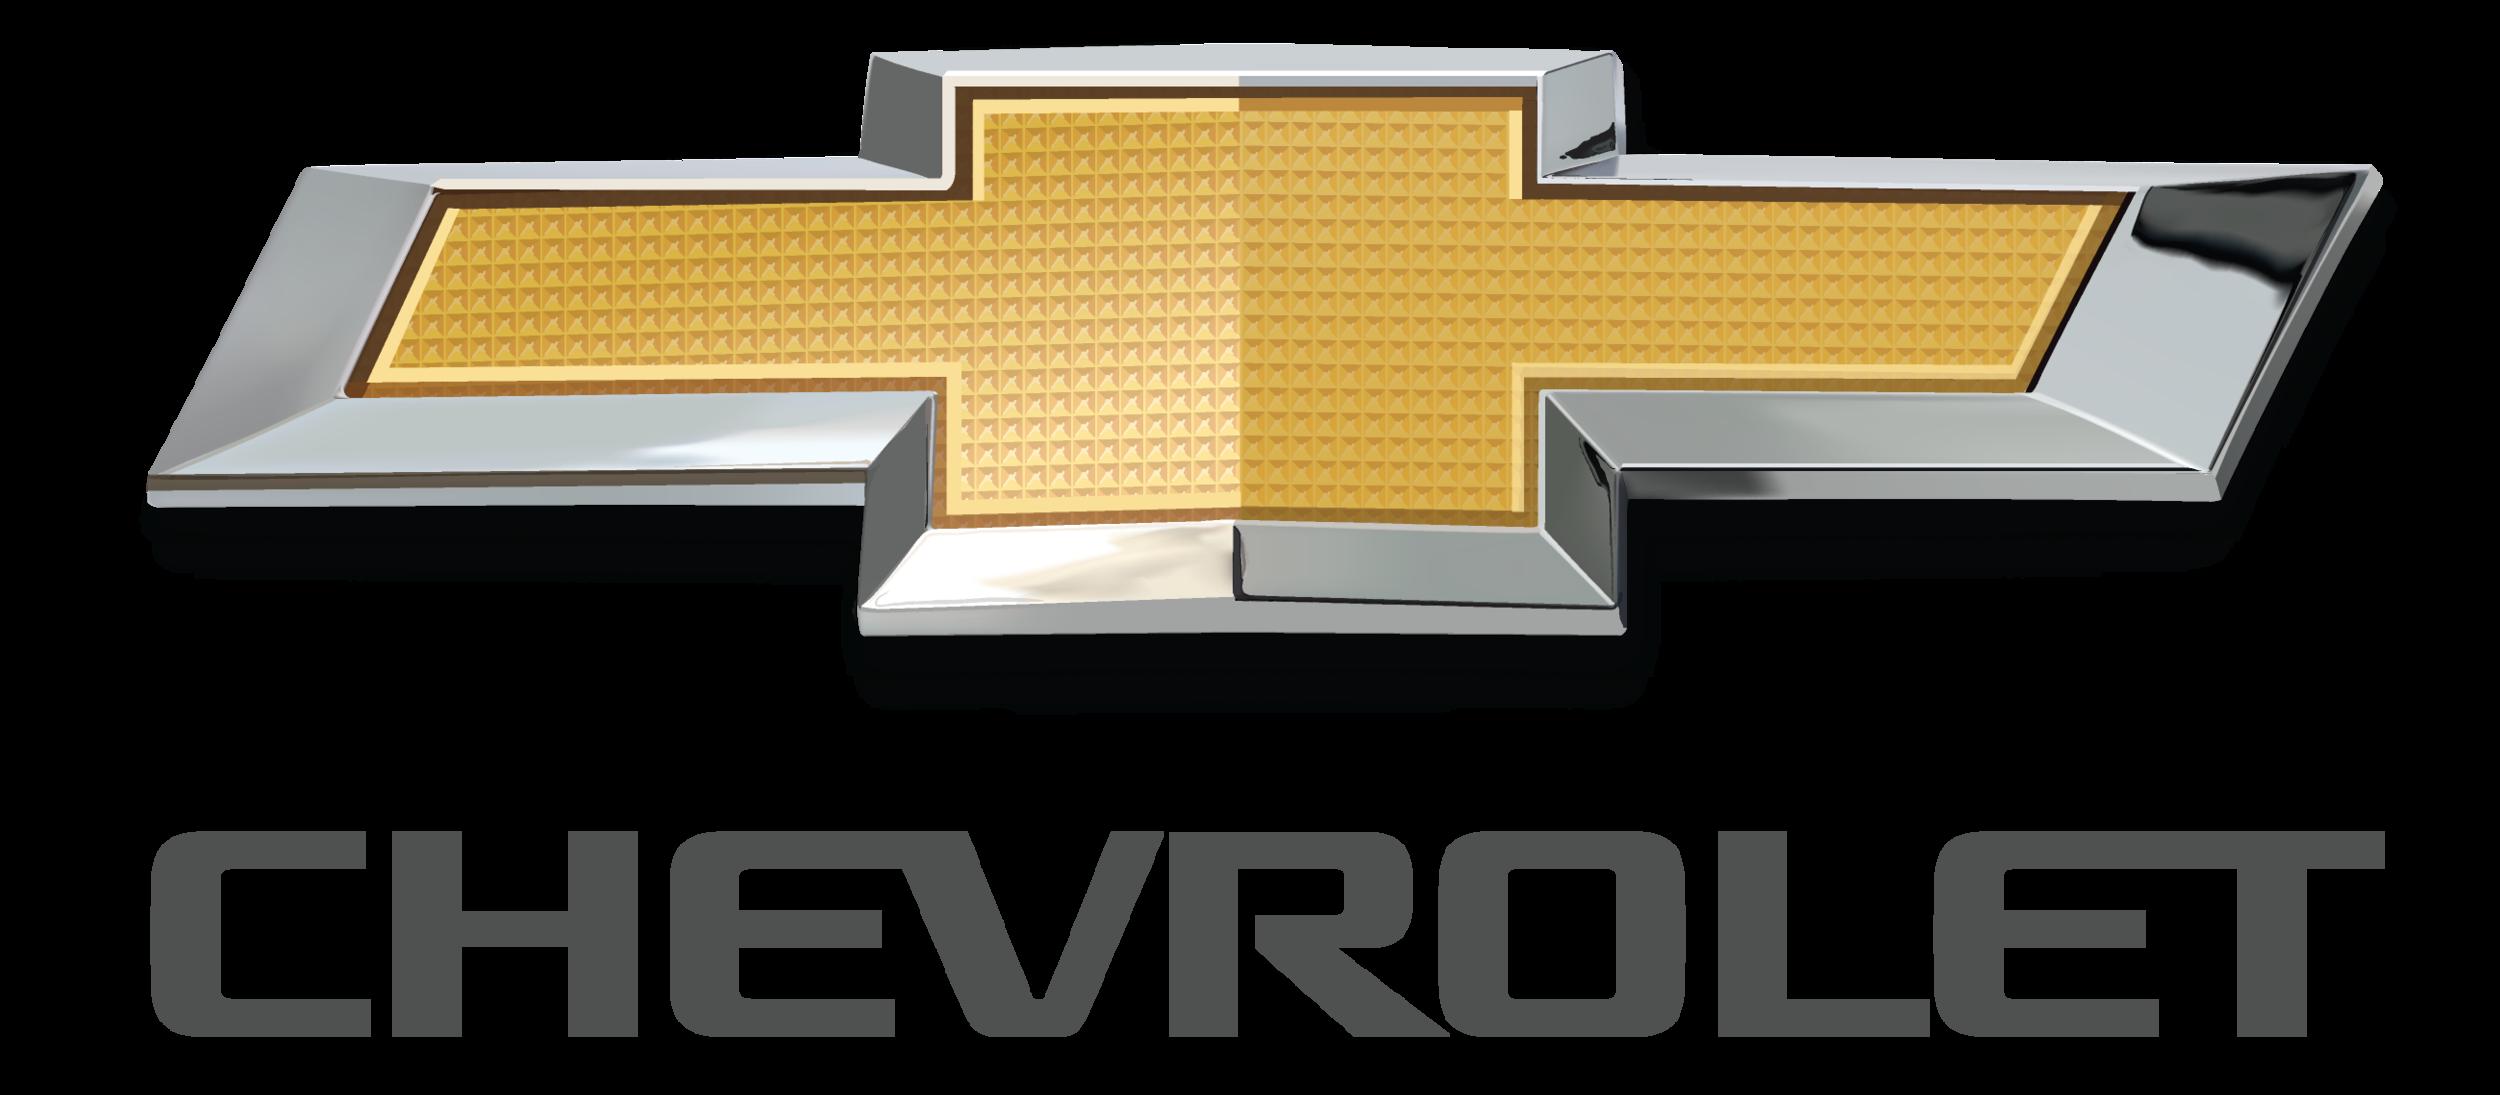 American-chevrolet-car-logo-download.png